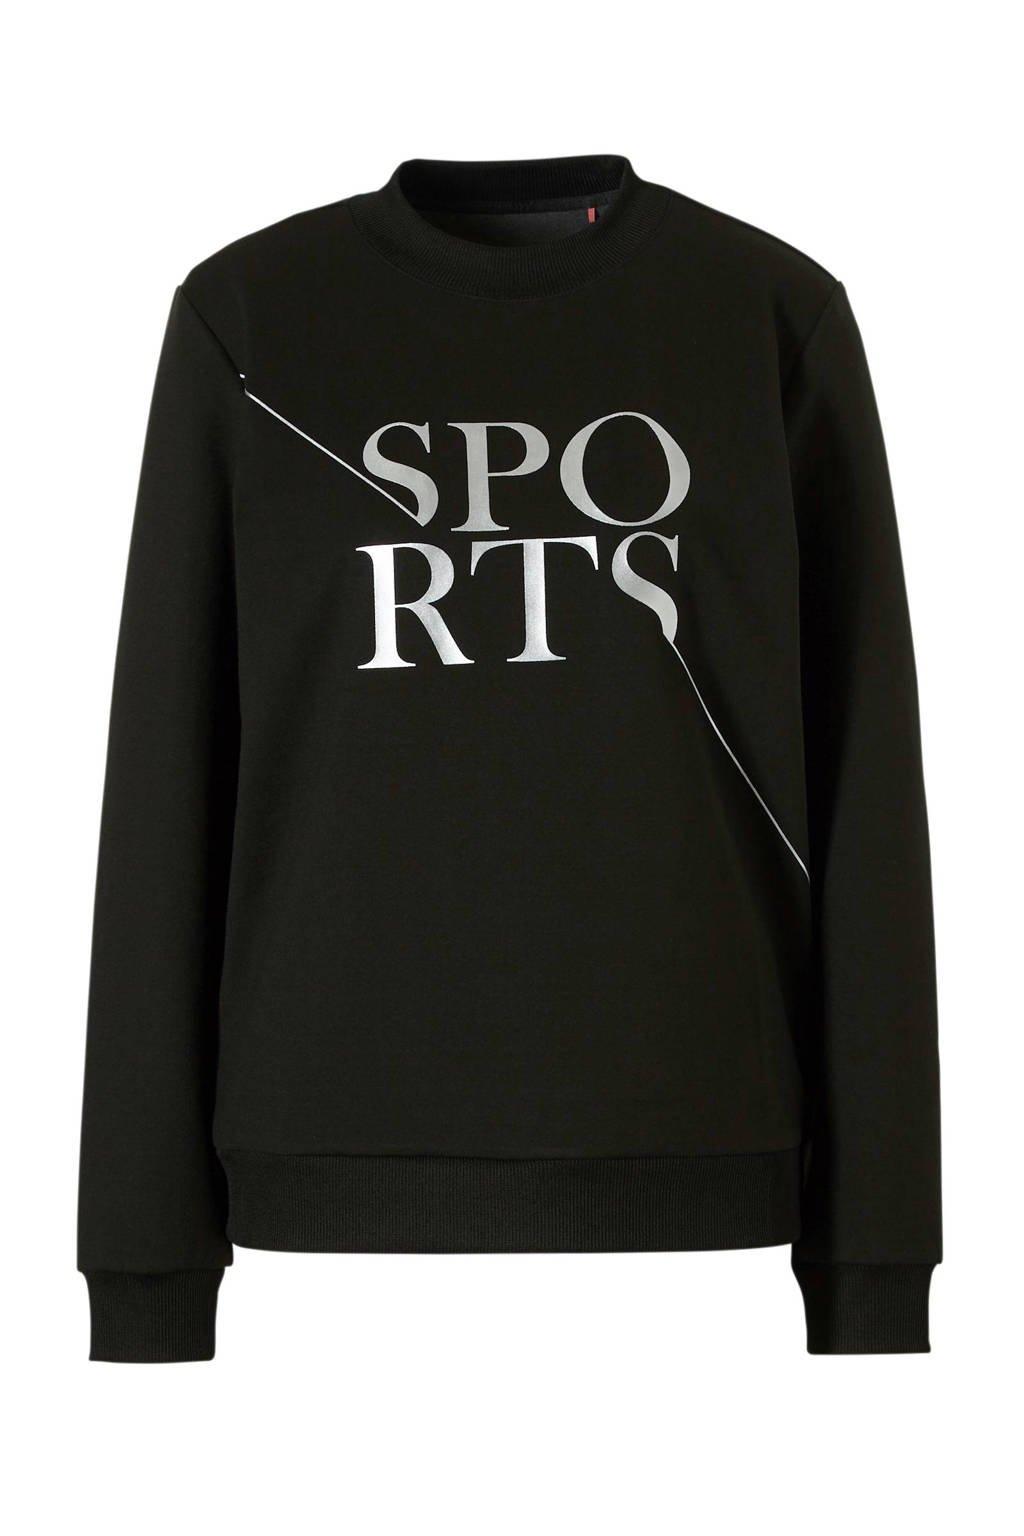 ESPRIT Women Sports sweater, Zwart